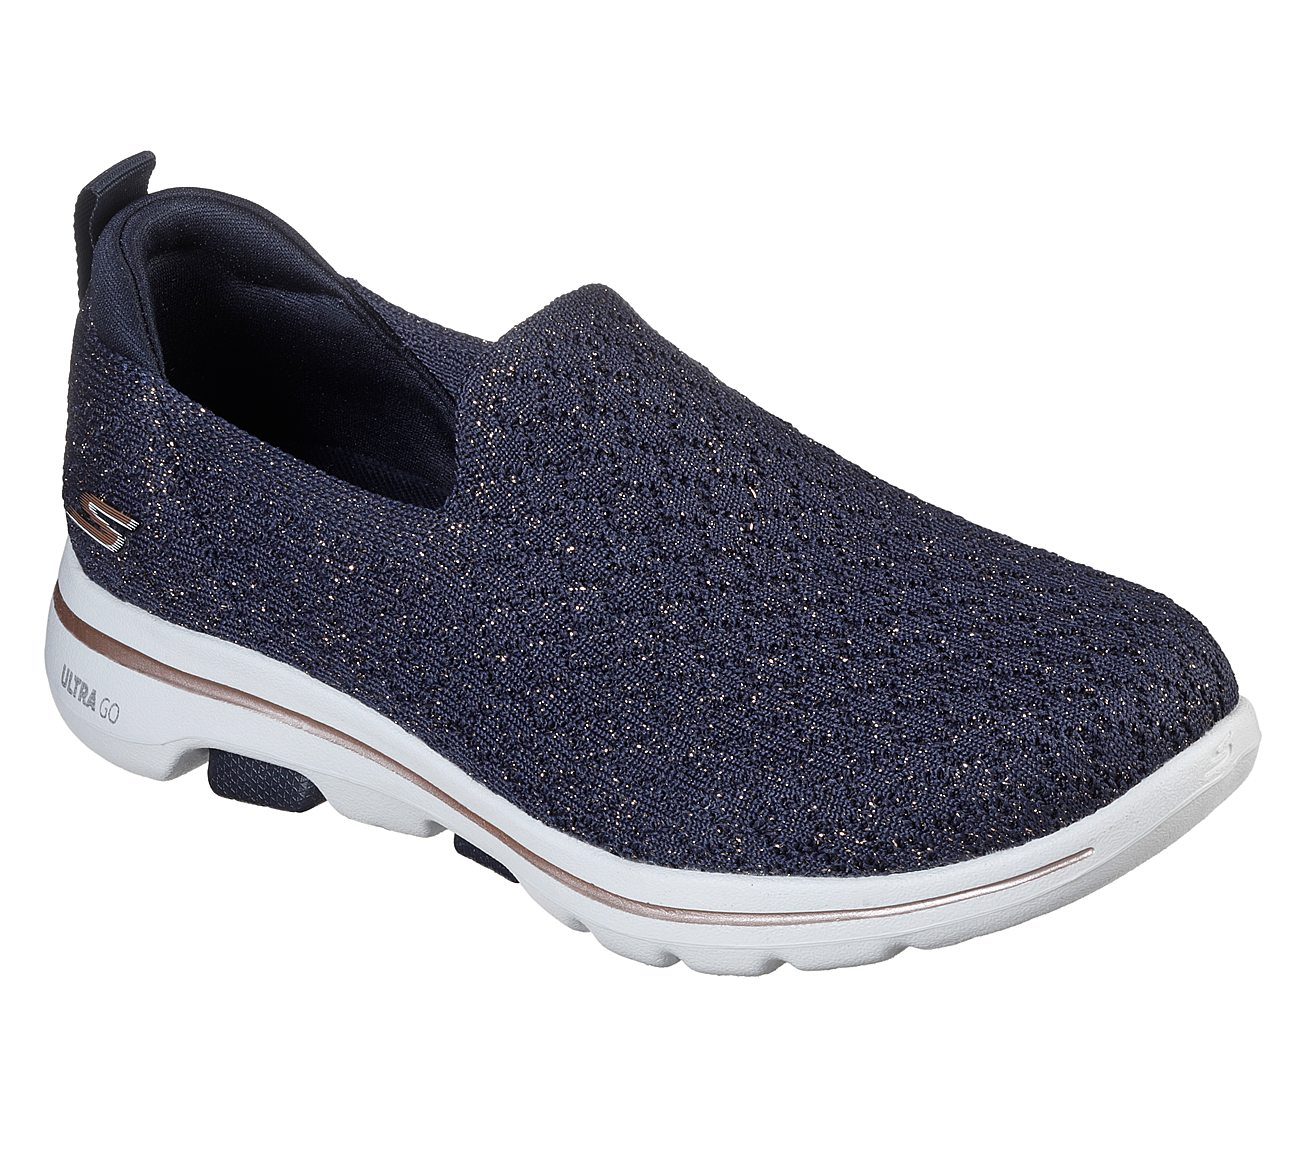 cdb48b59 Buy SKECHERS Skechers GOwalk 5 - Brave Skechers Performance Shoes ...